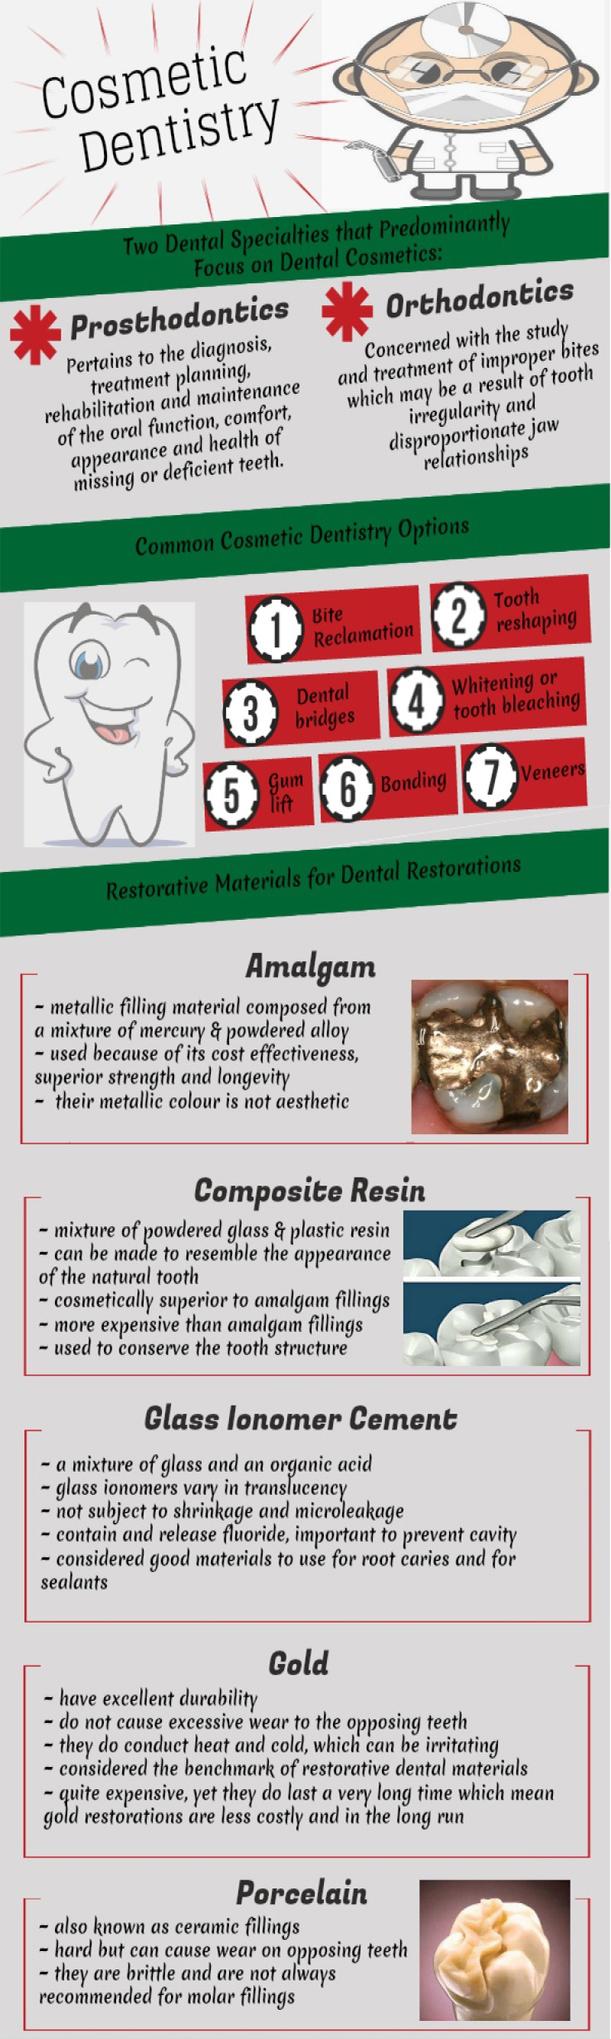 http://prismadental.com/services/cosmetic-dentistry/